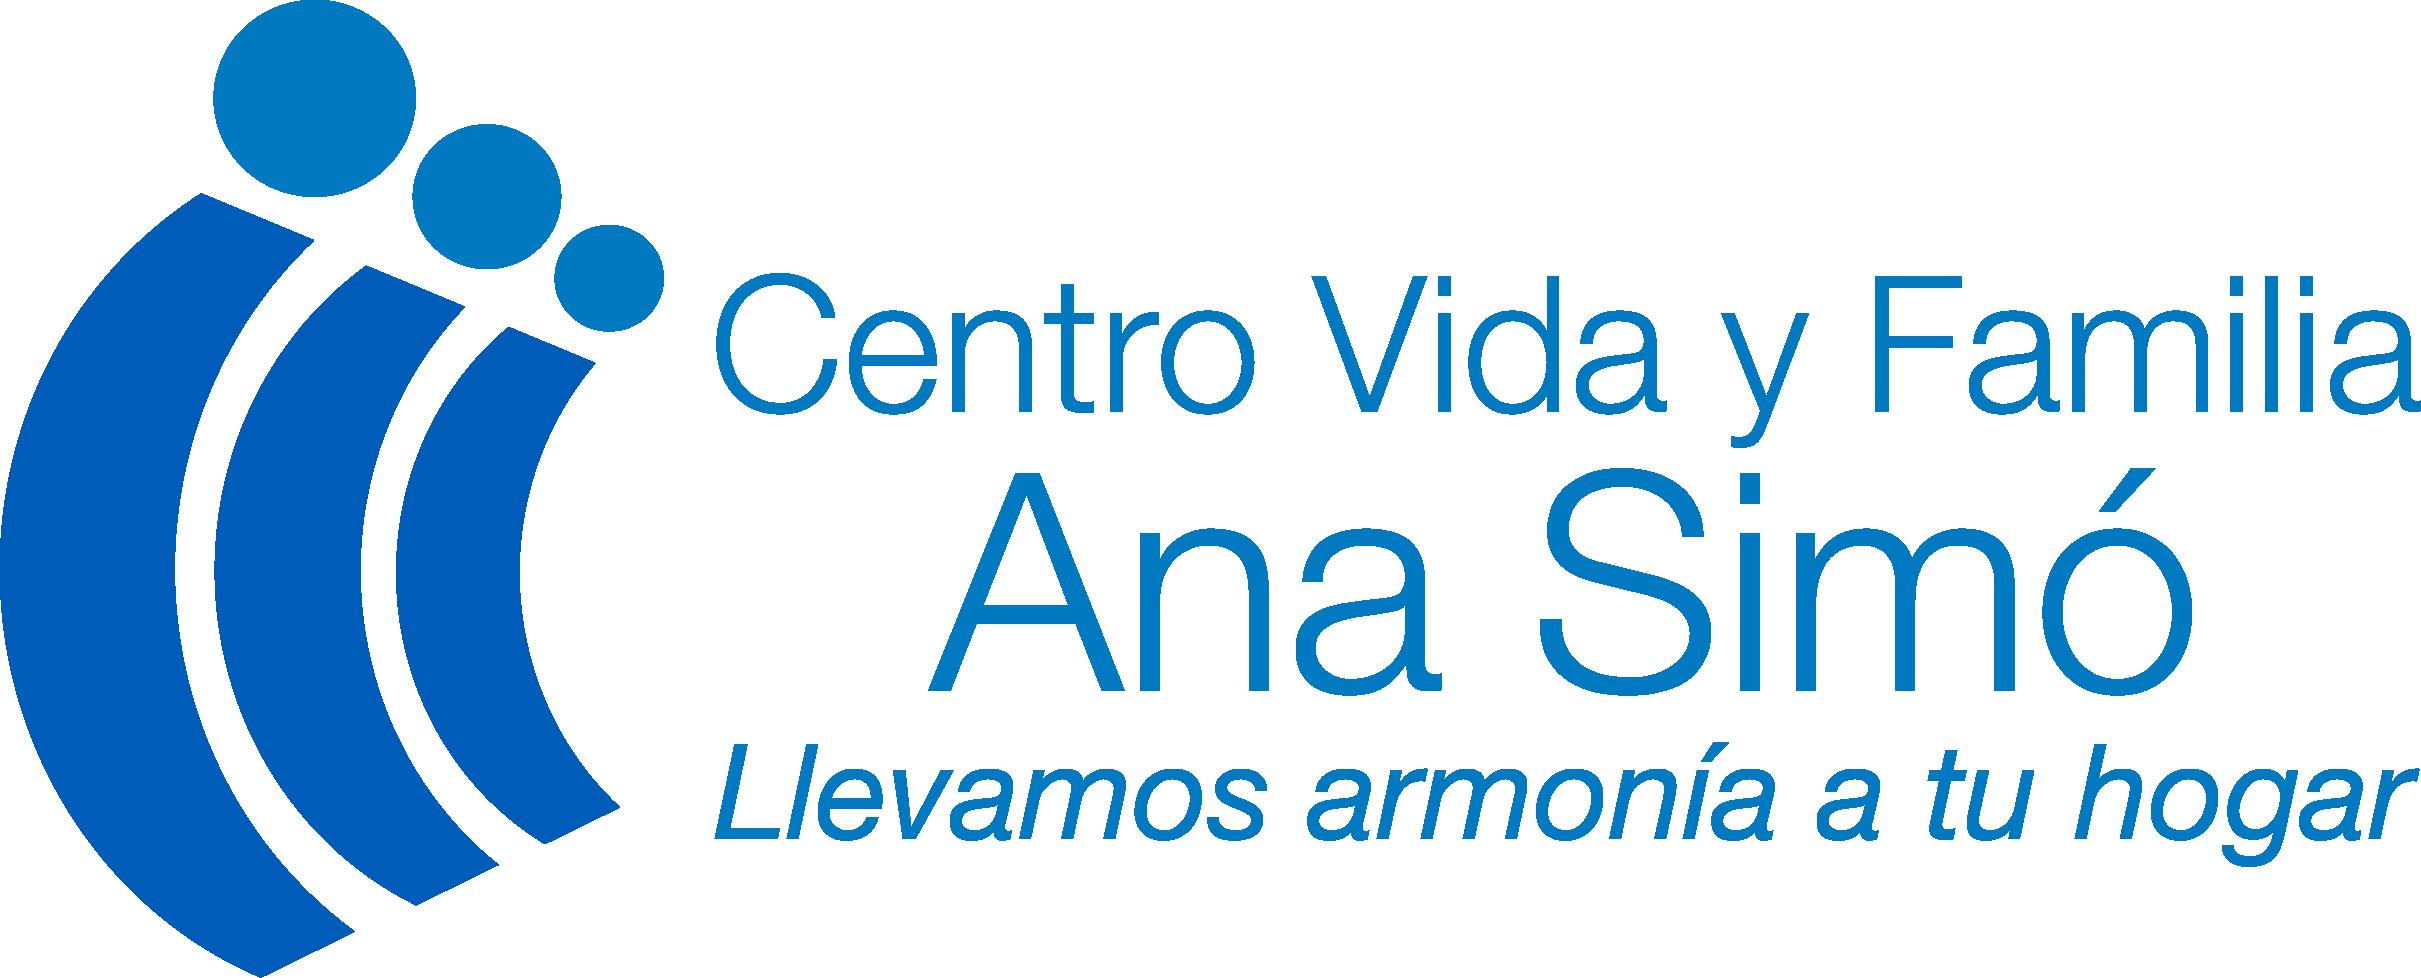 Logo Centro Vida y Familia